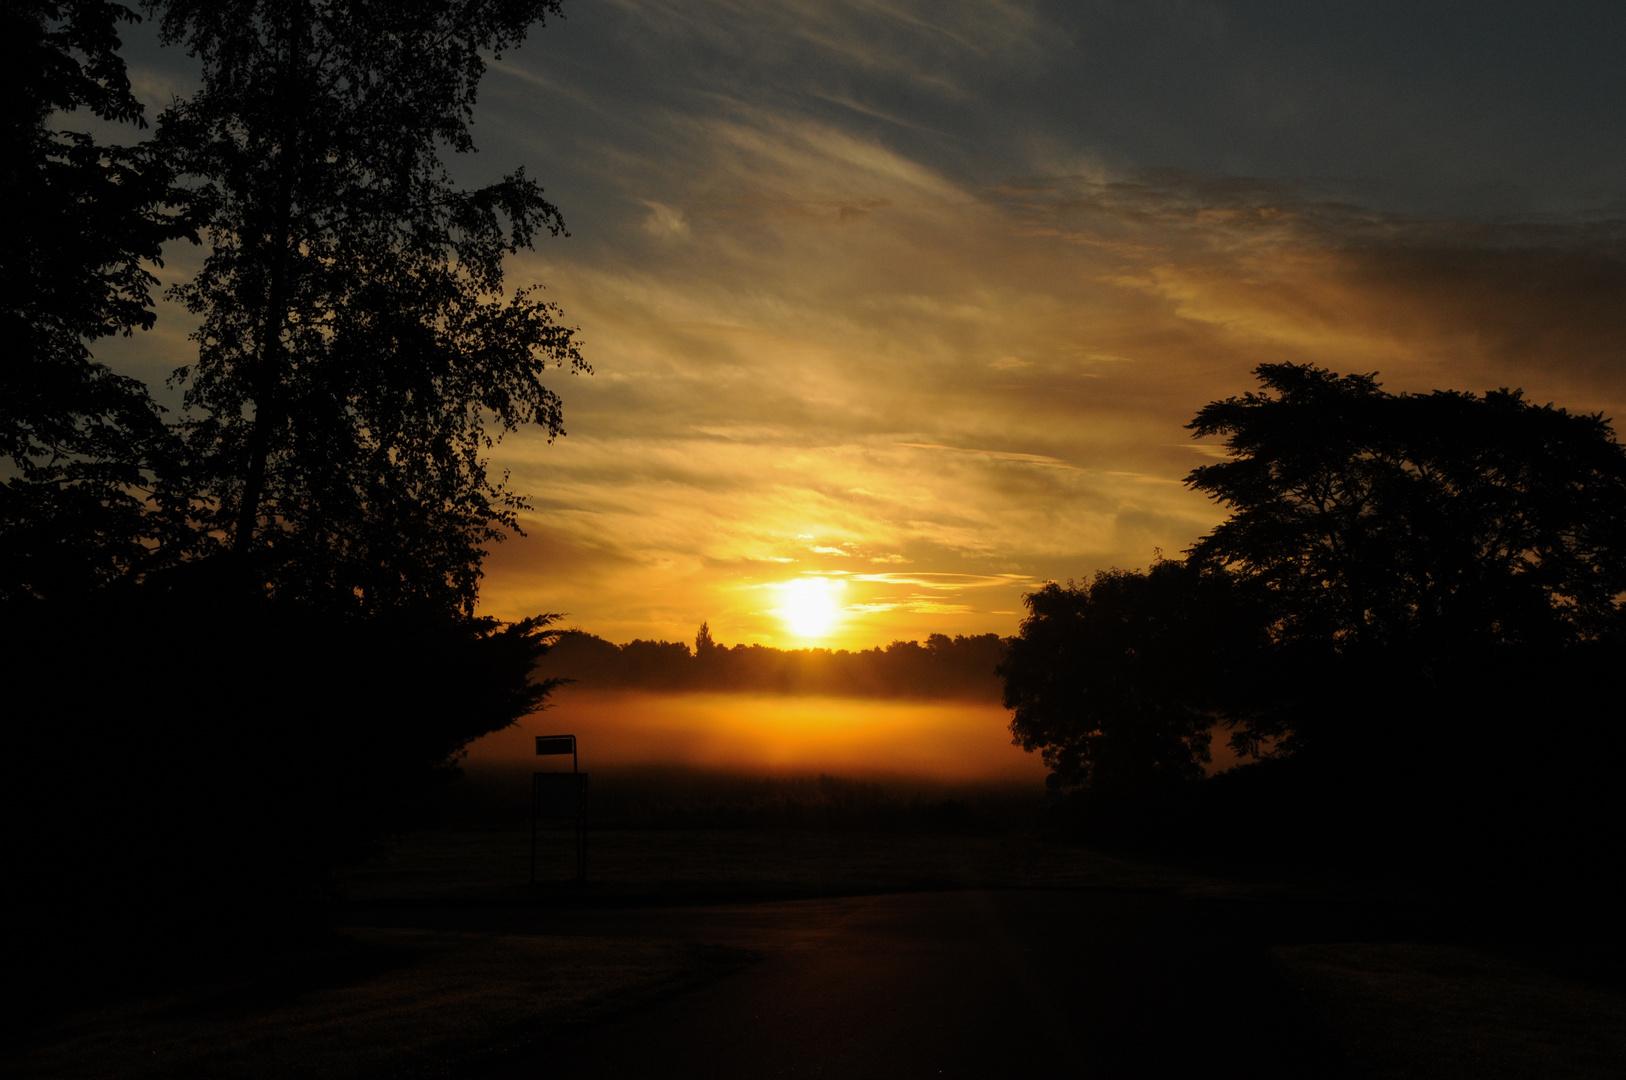 Sonnenaufgang in Dronningmölle 2